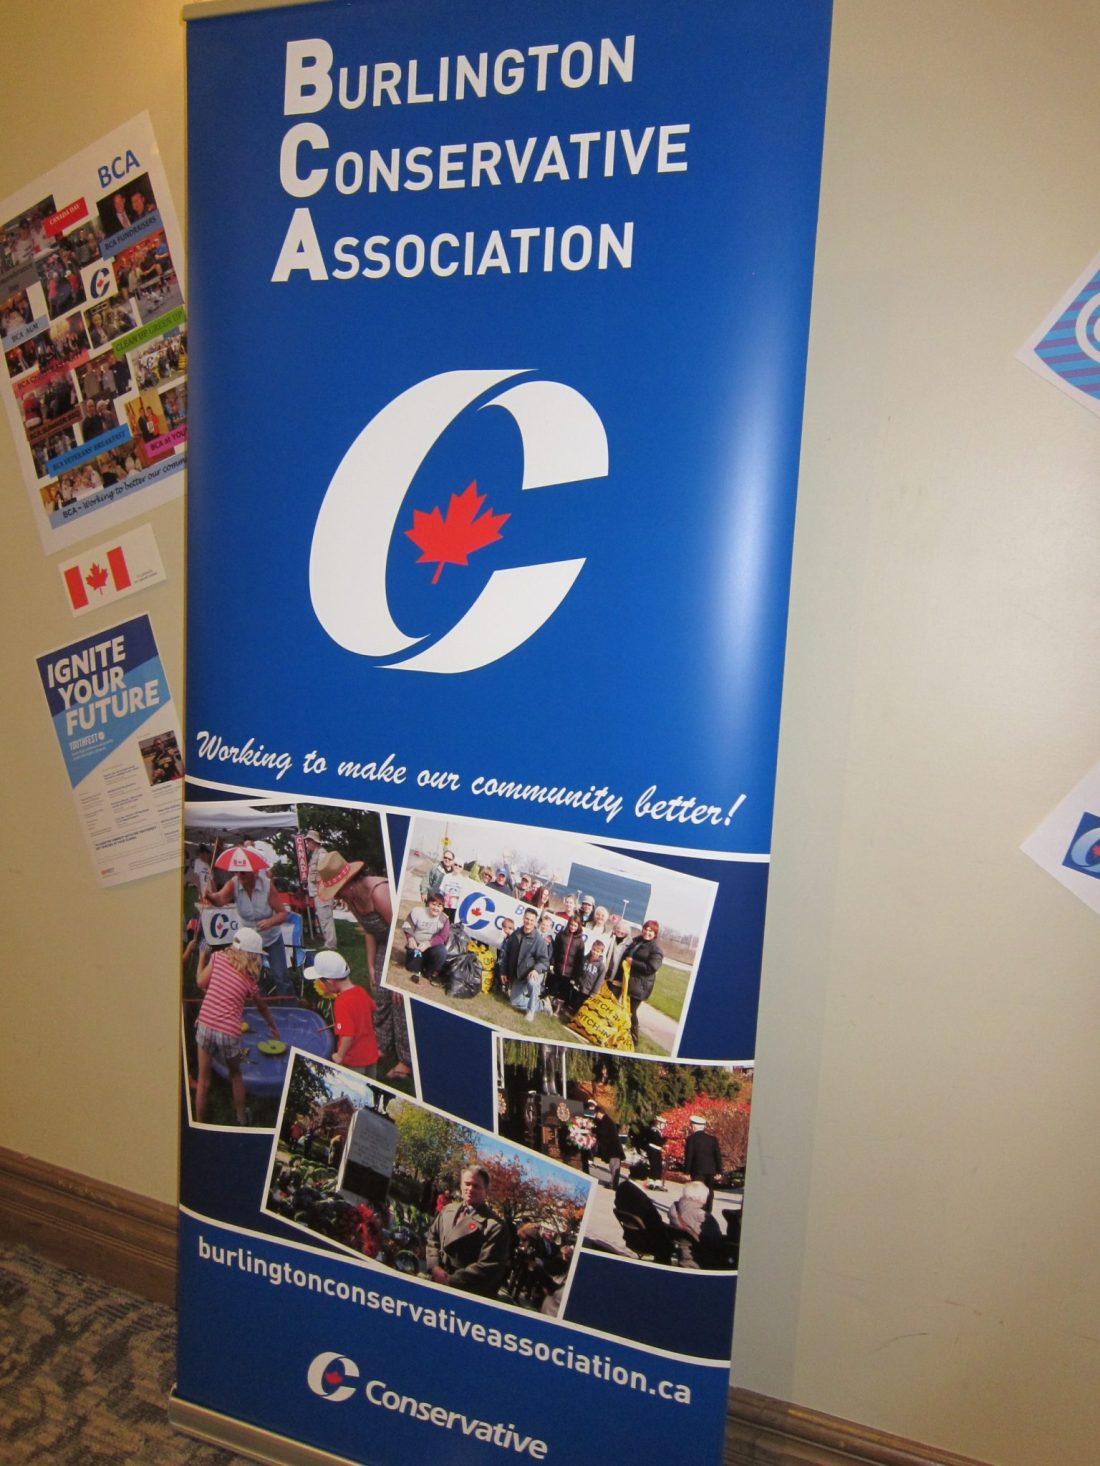 We hope you enjoy our BCA Photo Carousel!